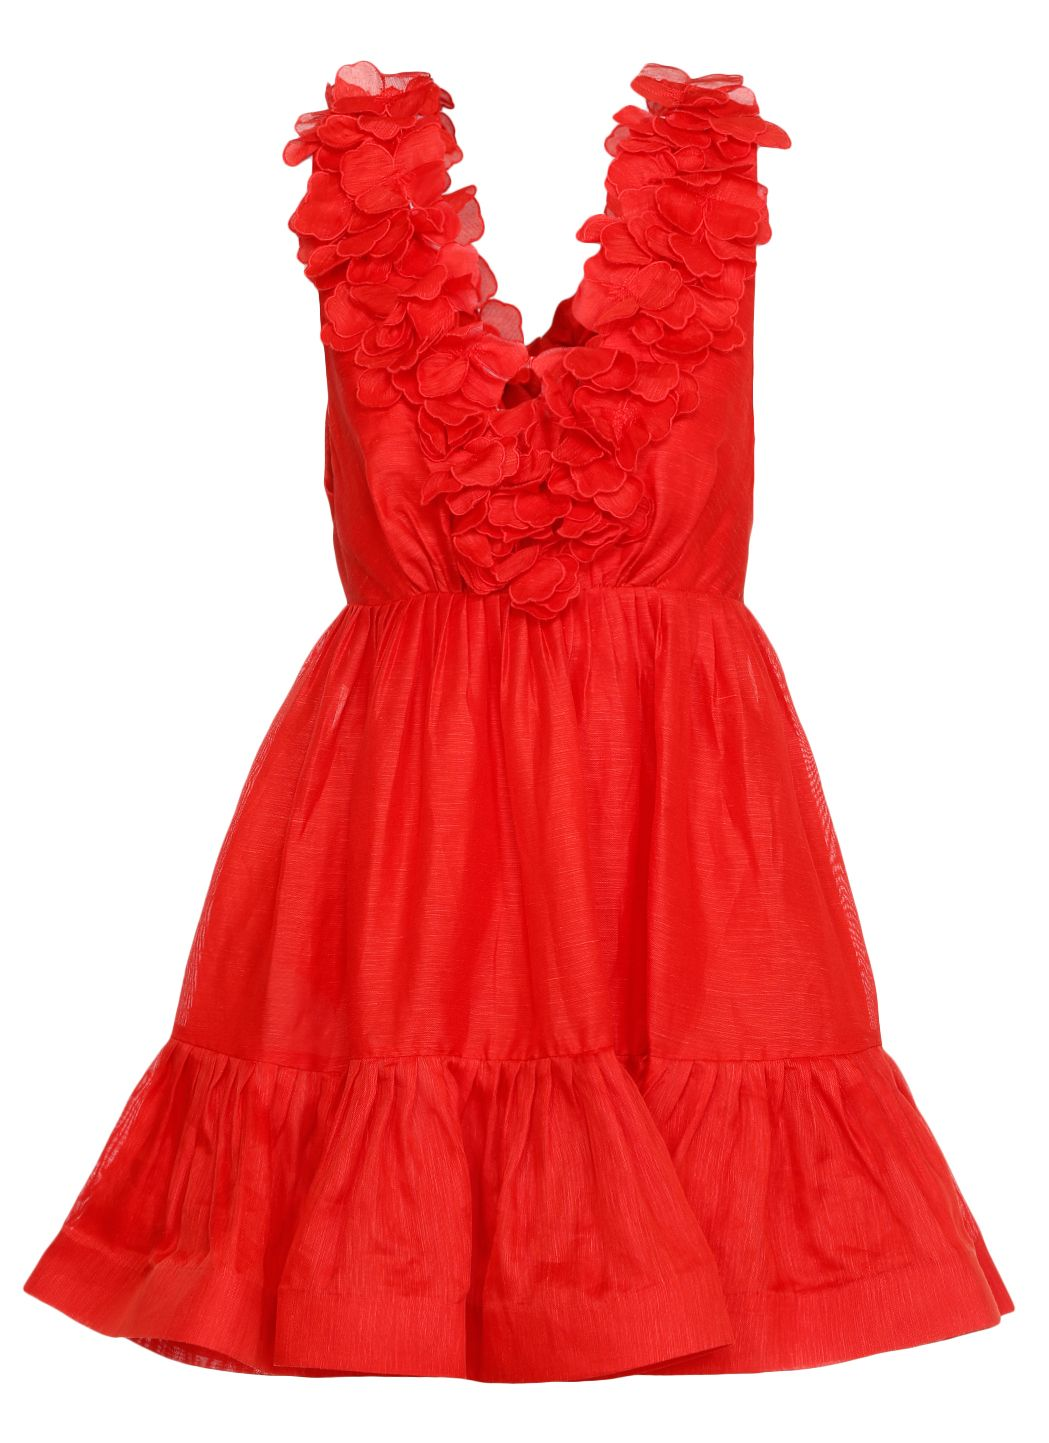 The Lovestruck Garland Mini dress